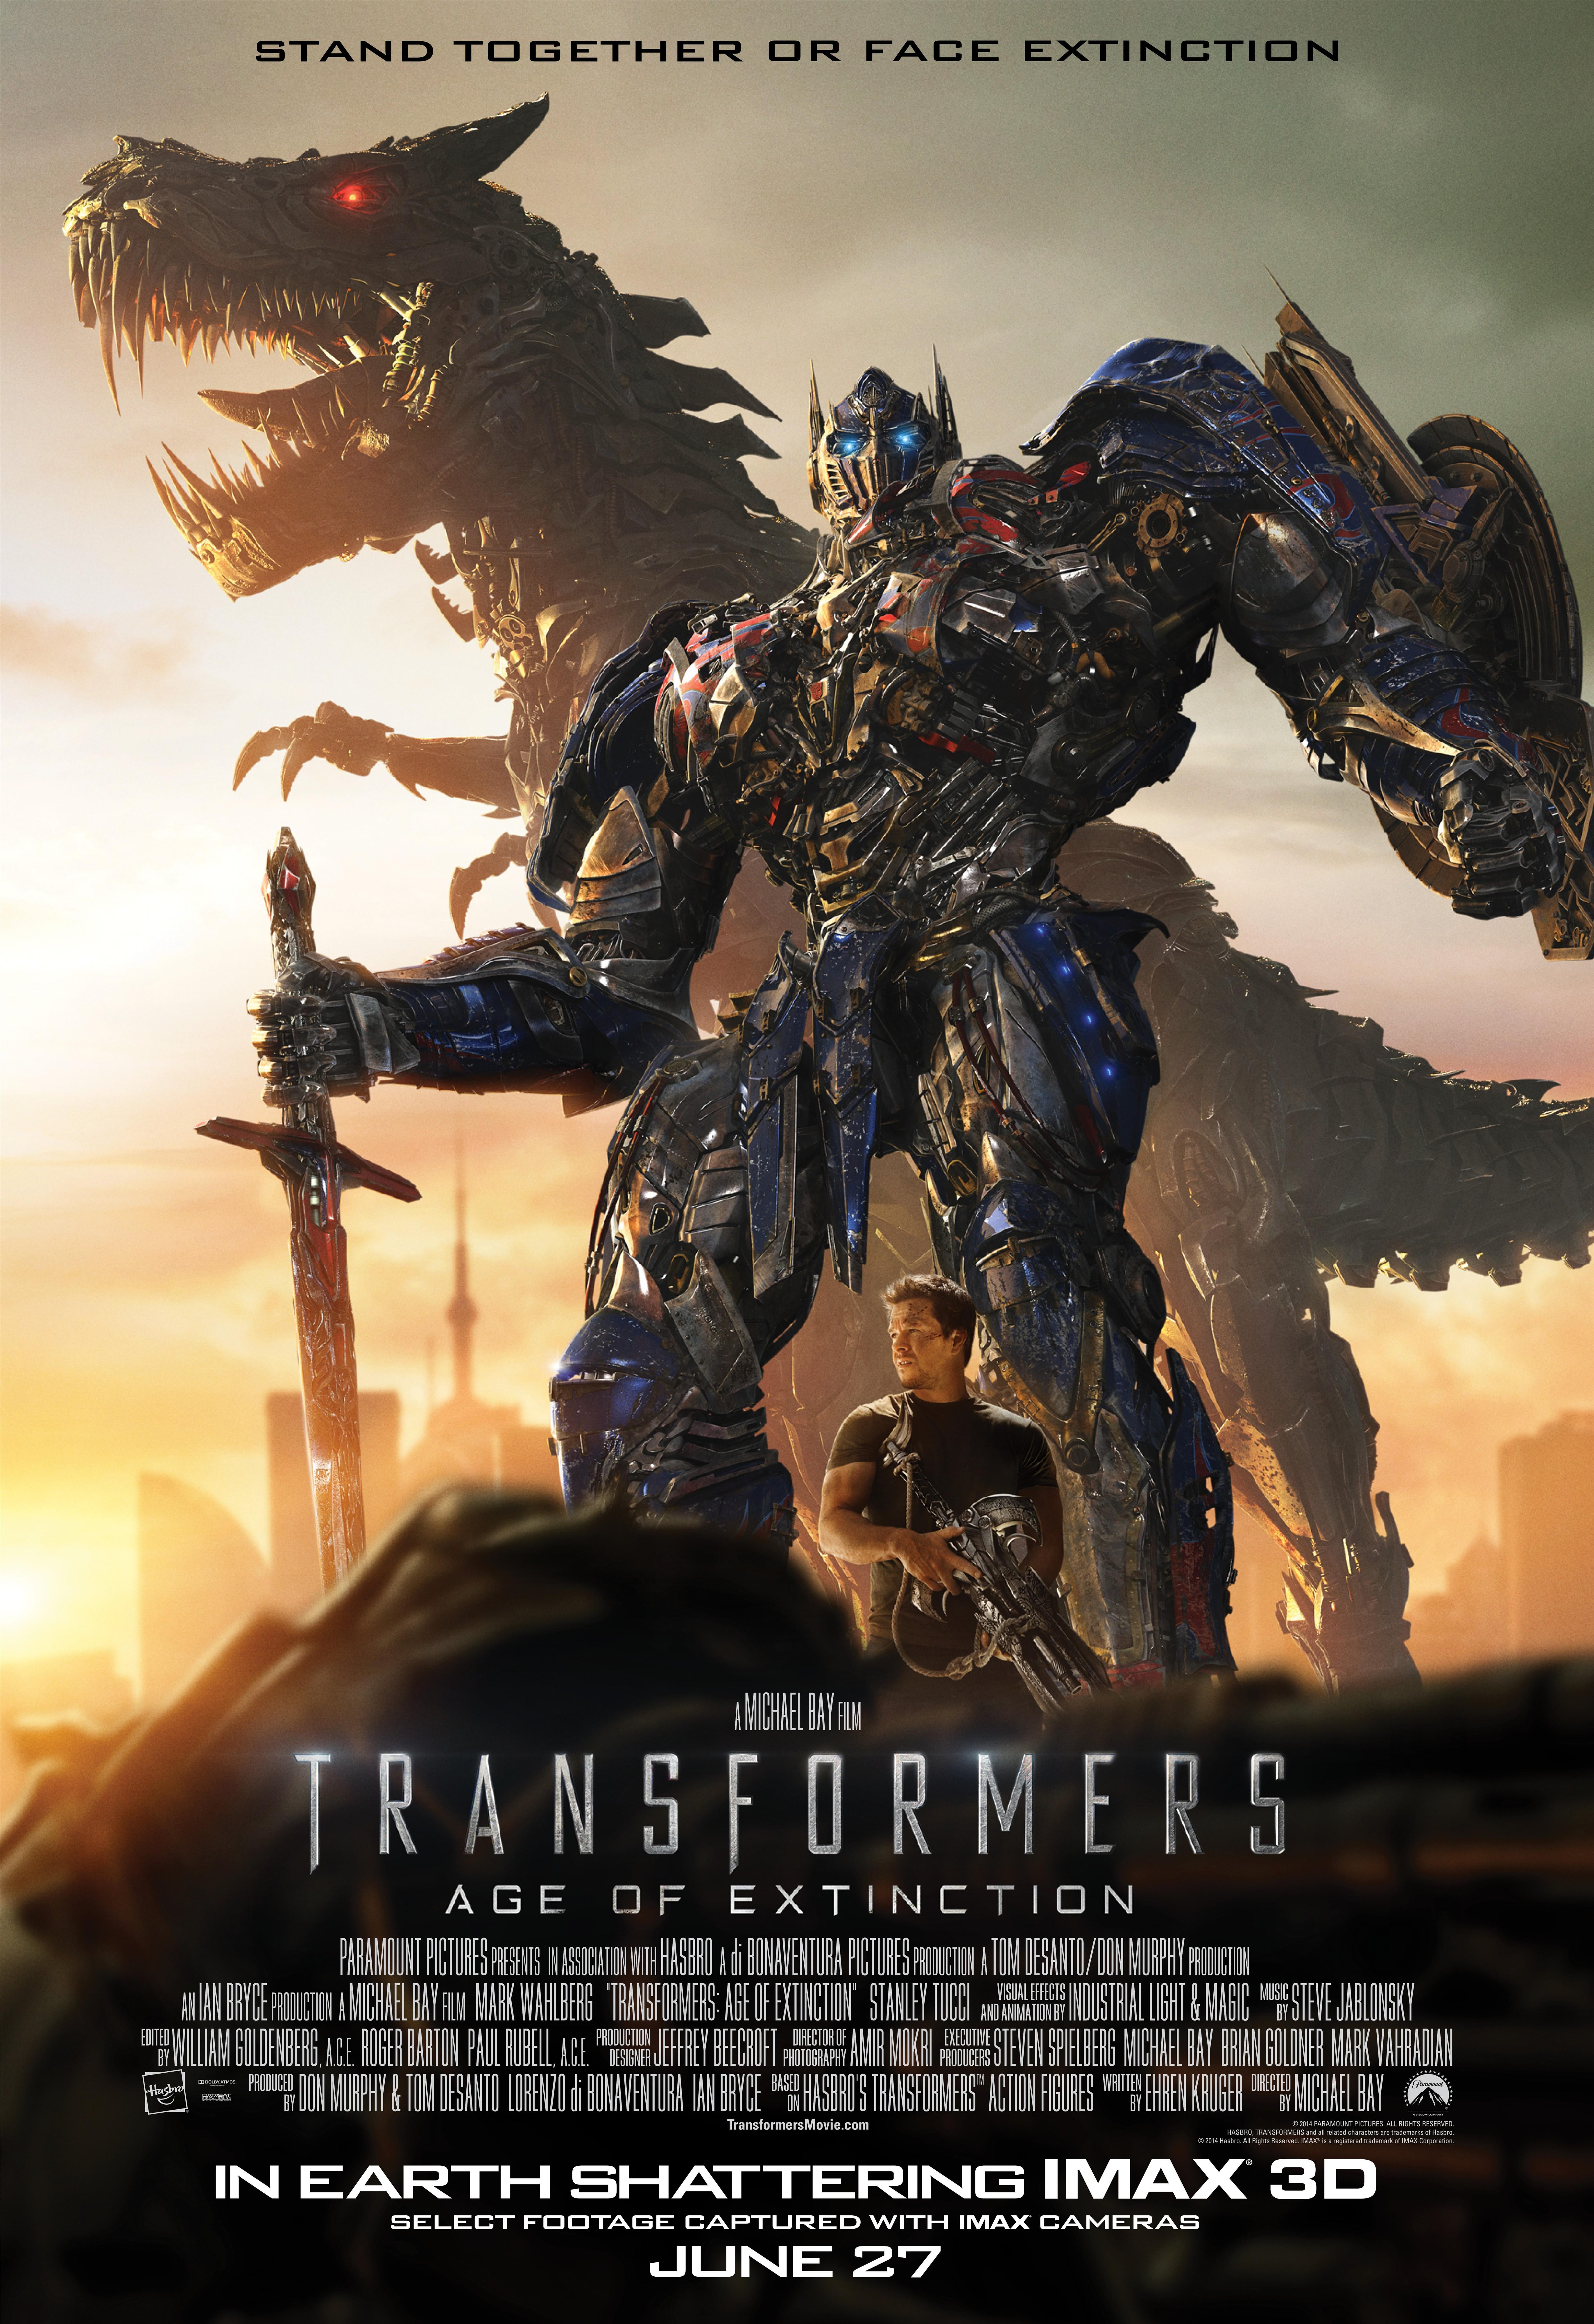 Optimus Prime, Transformers Age